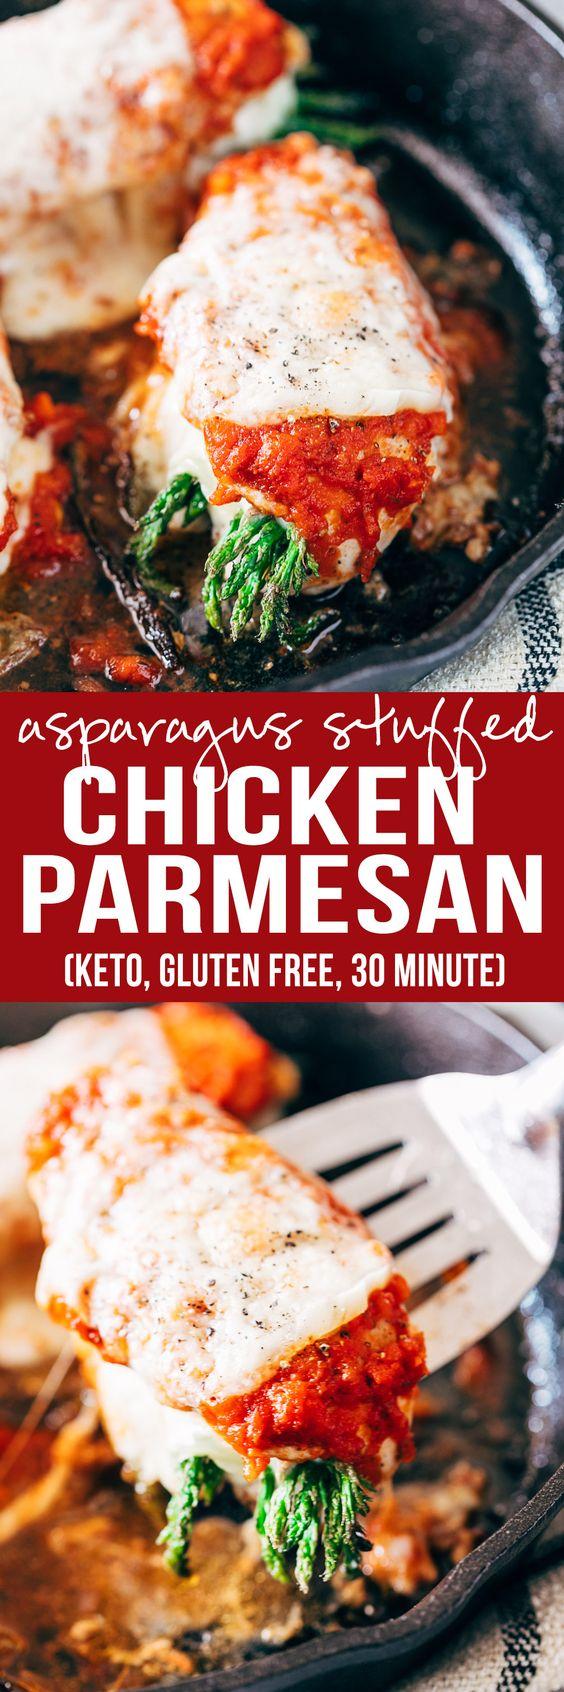 asparagus stuffed chicken parmesan (keto, gluten free, 30 min)